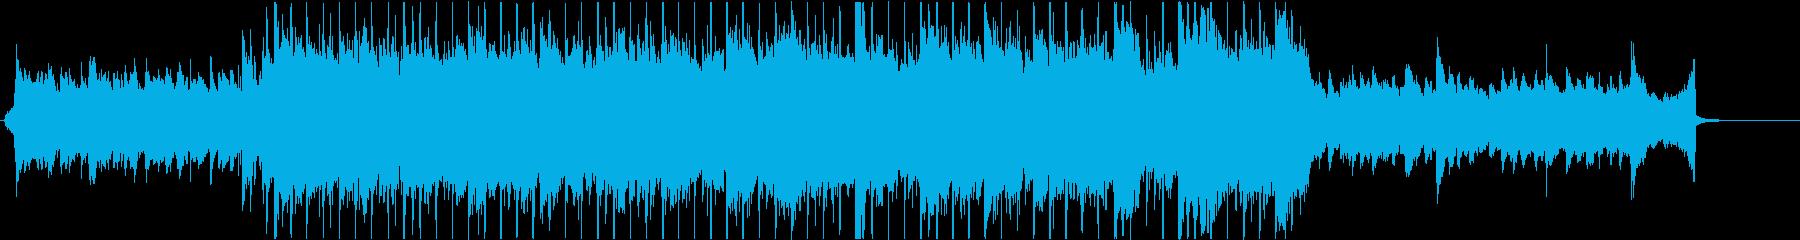 Aギターが印象的、明るいBGM60秒編集の再生済みの波形